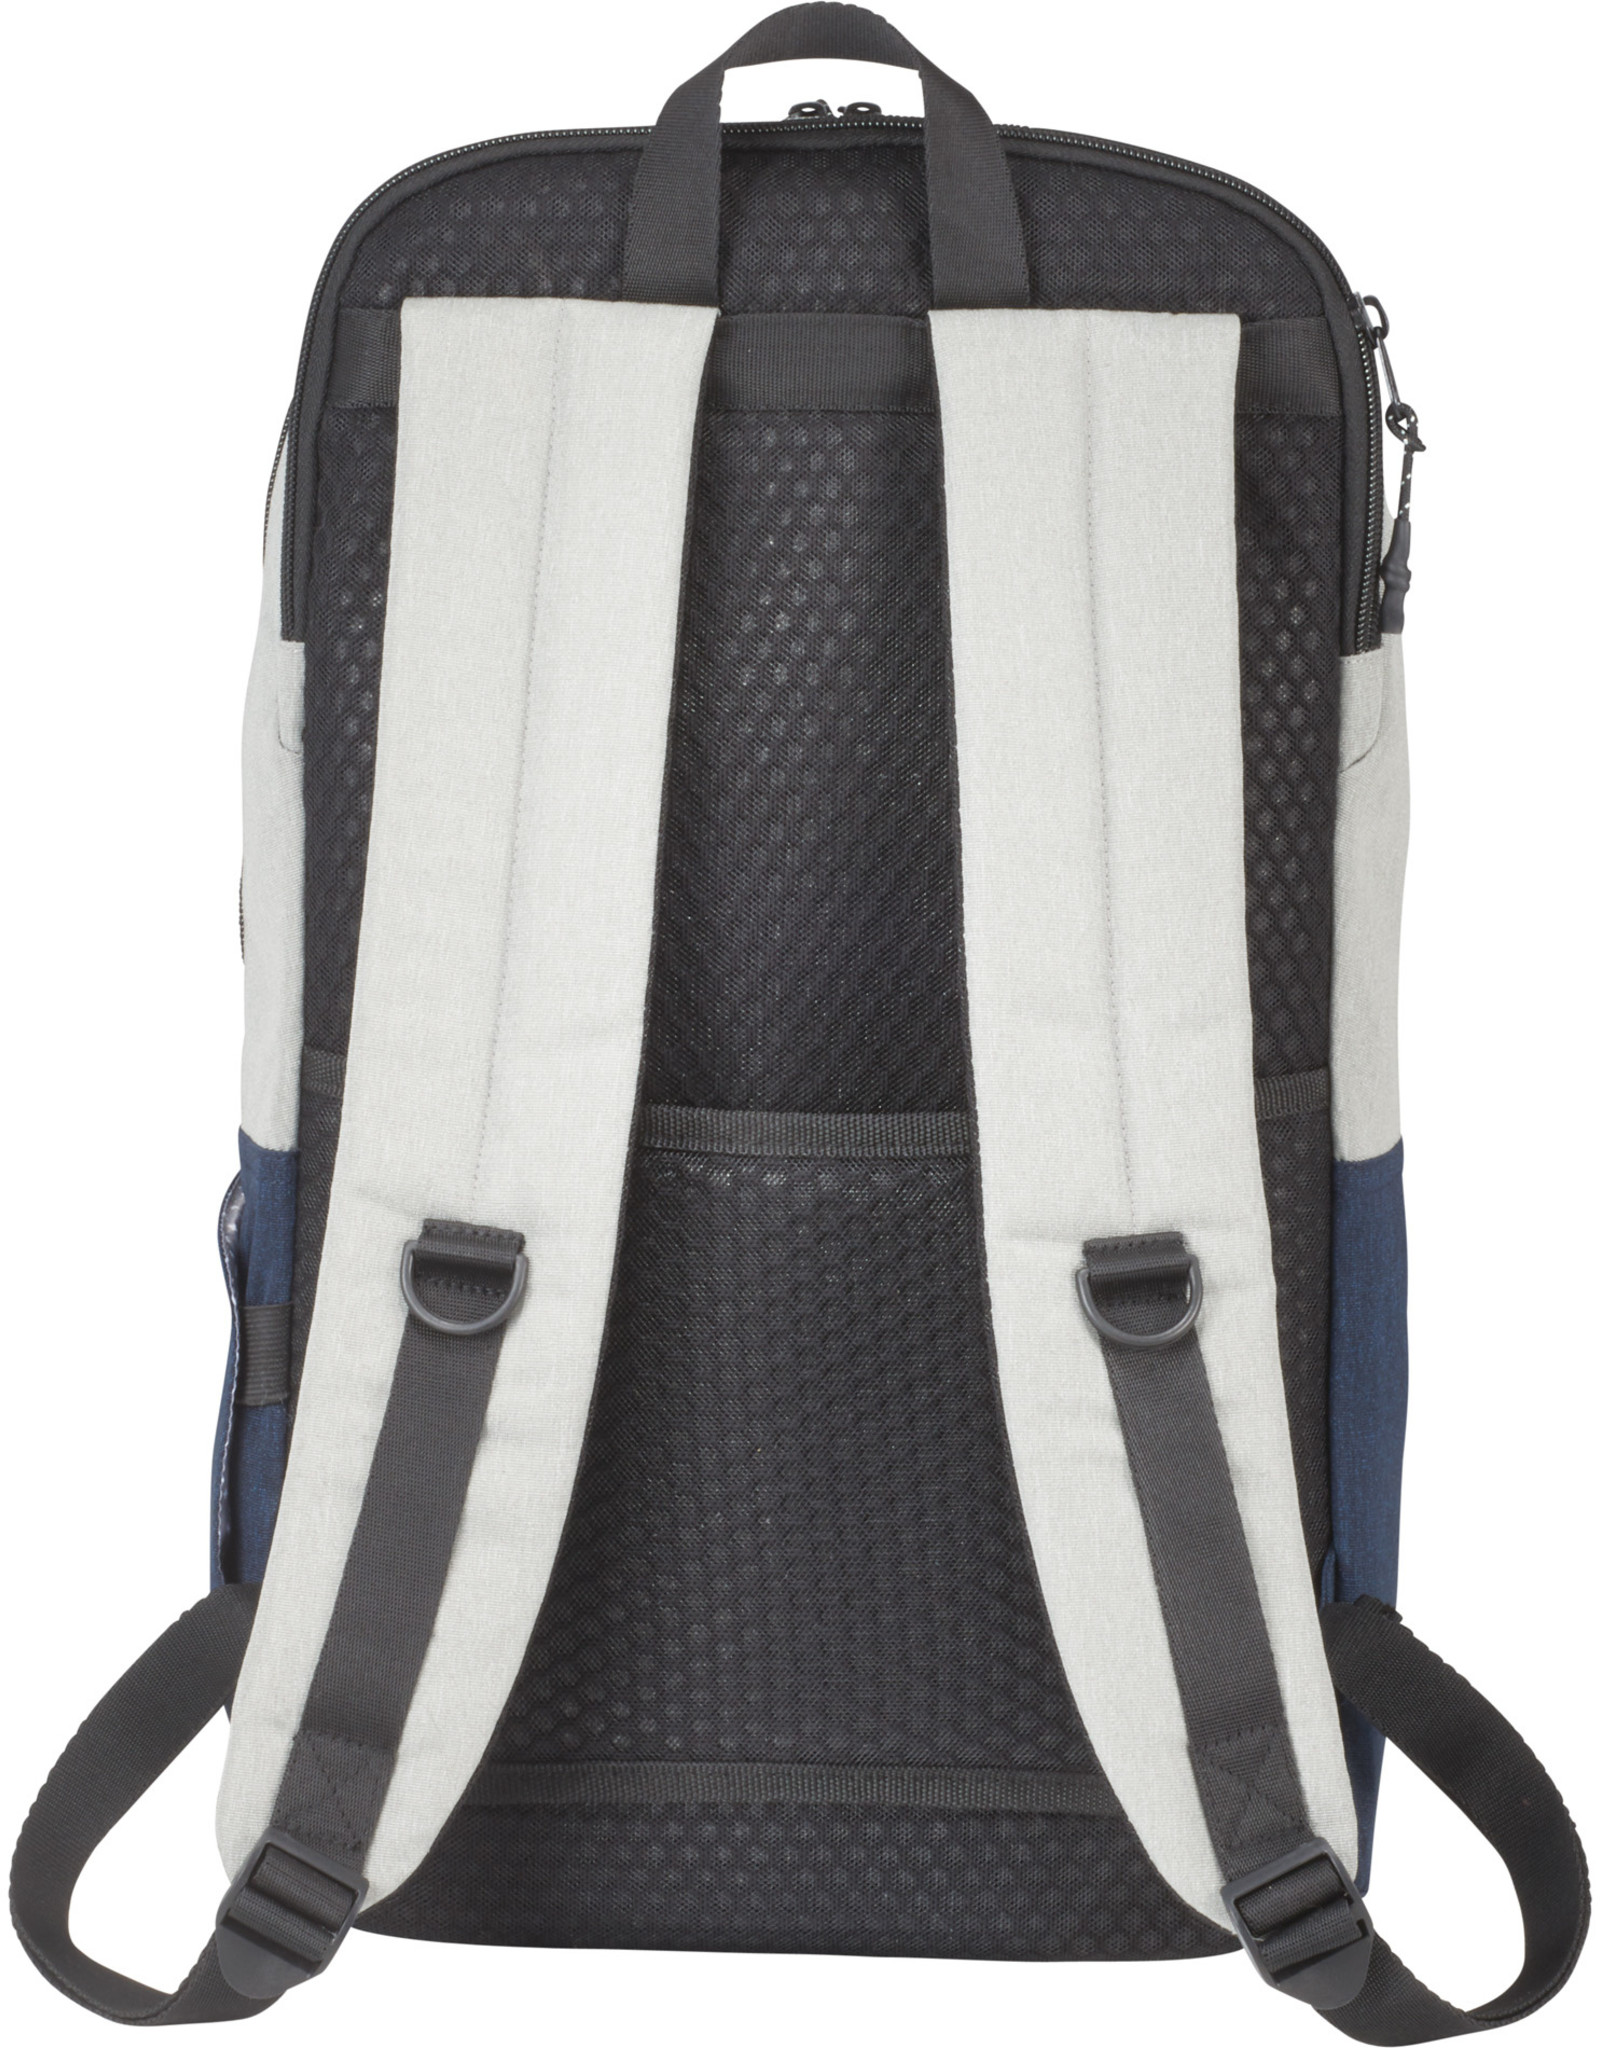 Metro Computer Backpack *FINAL SALE*